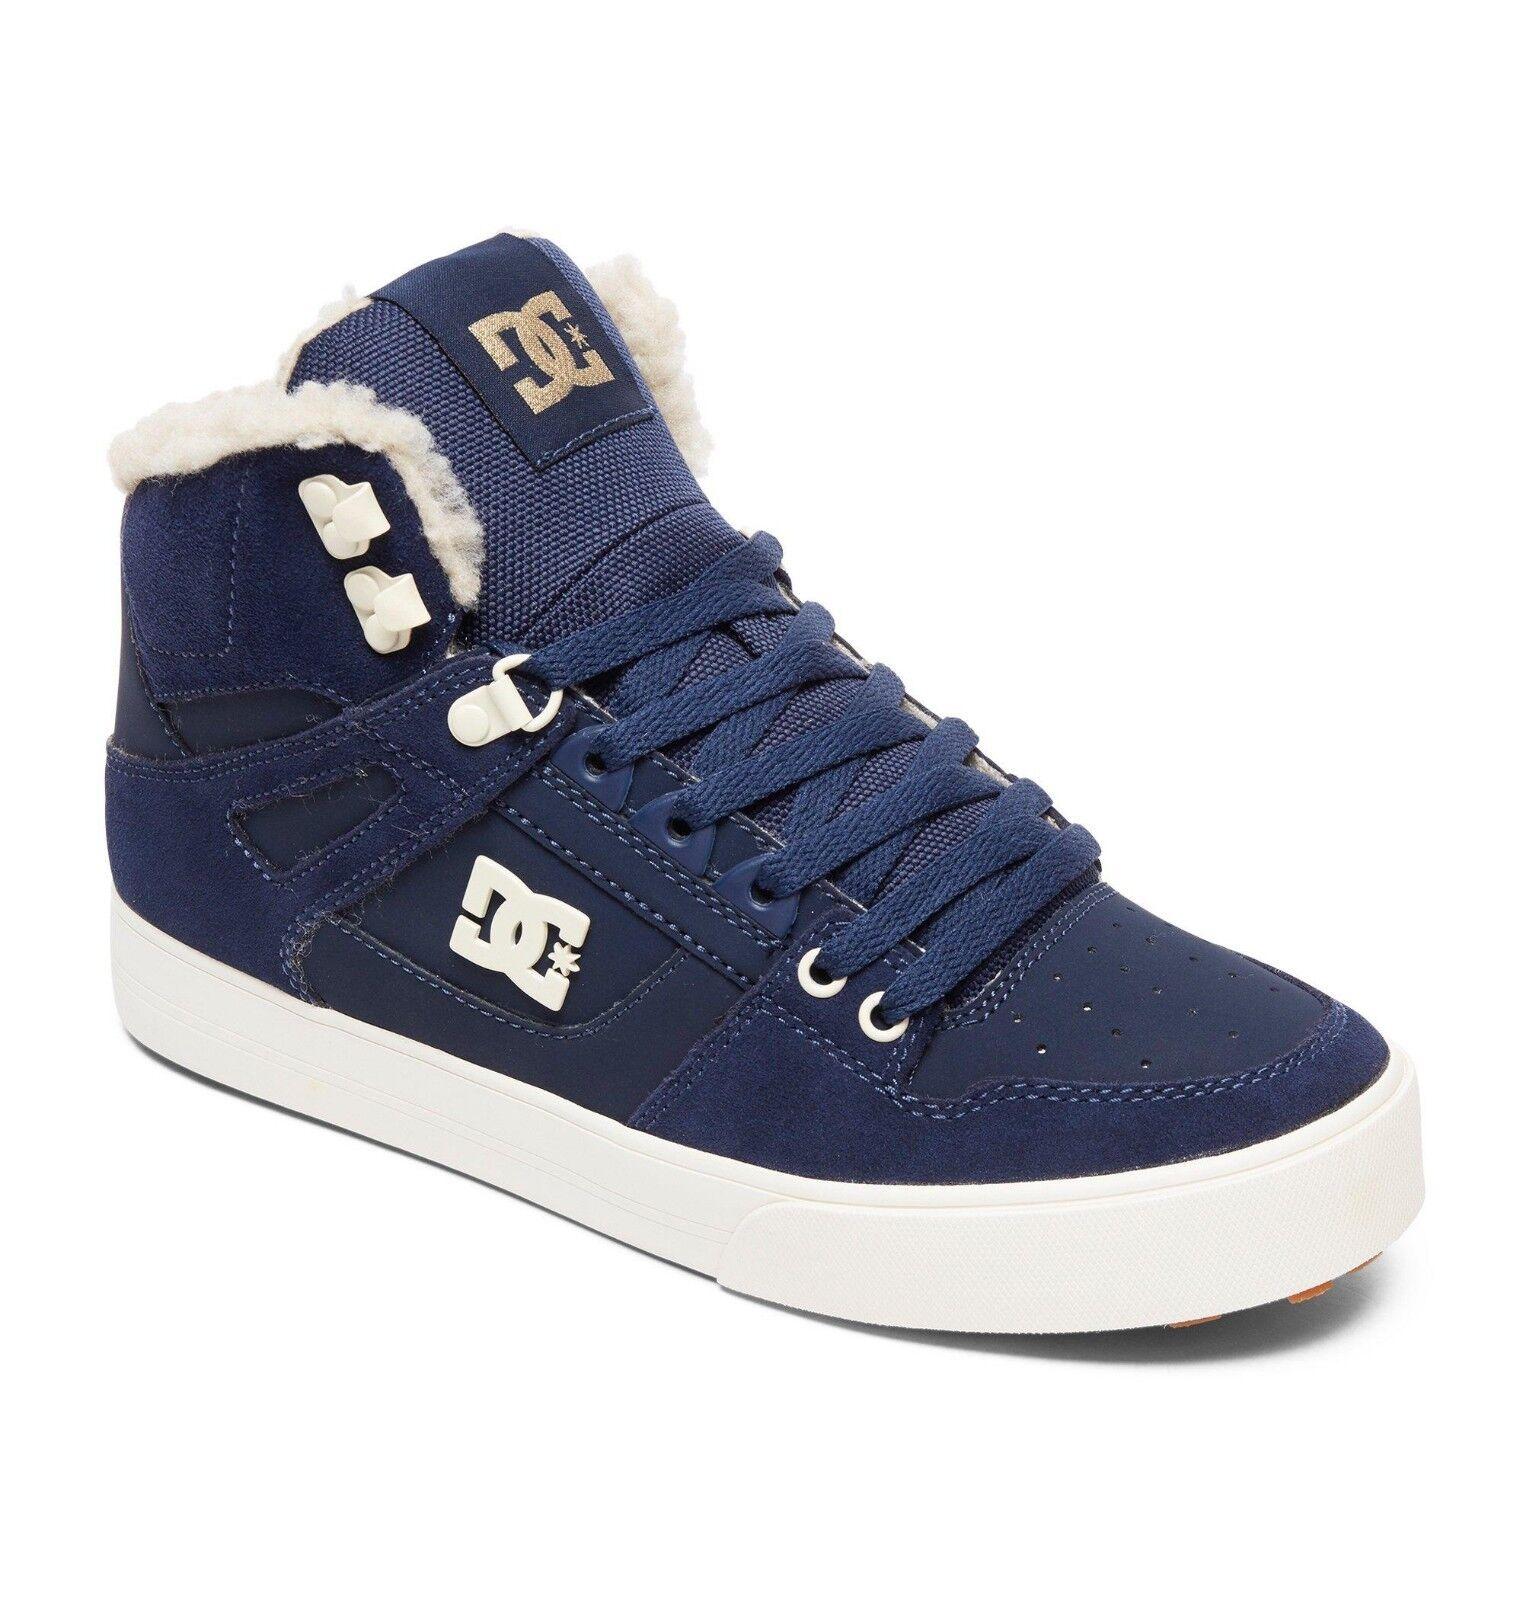 Zapatos botas para hombre Hi Top DC. Zapatos Altos De Cuero Forrado PURE WINTERIZED 8W 47 NKH